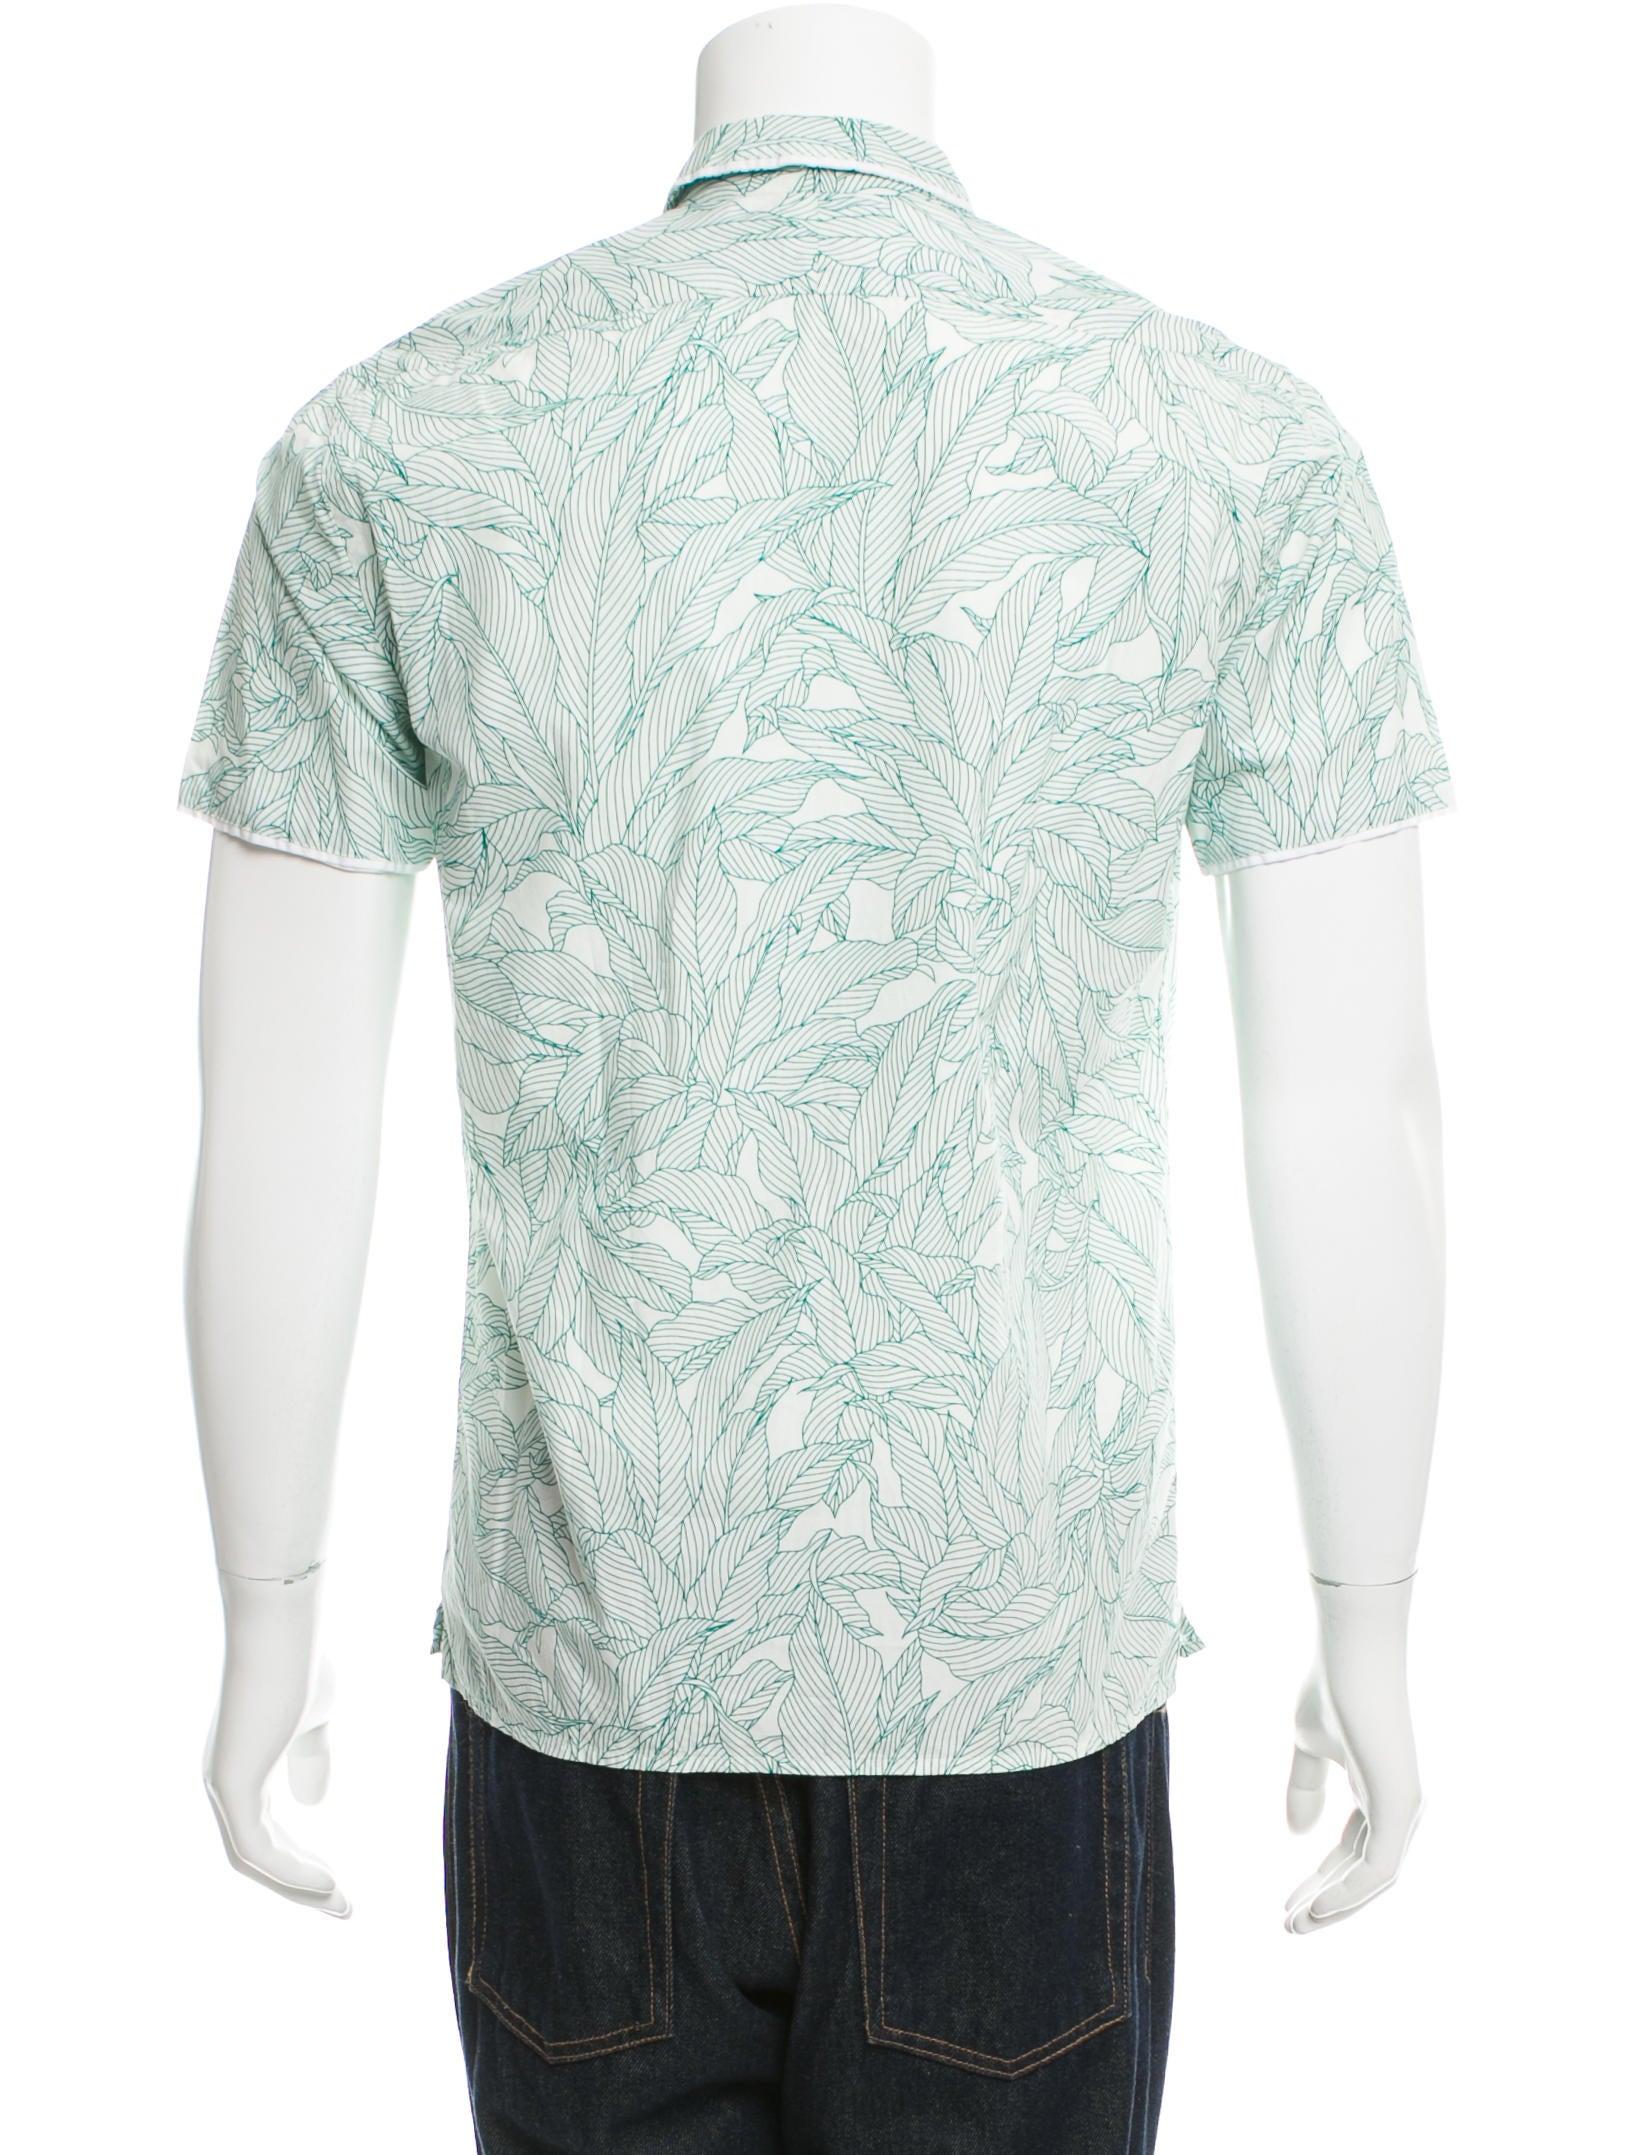 Paul smith jeans floral print button up shirt clothing for Floral print button up shirt